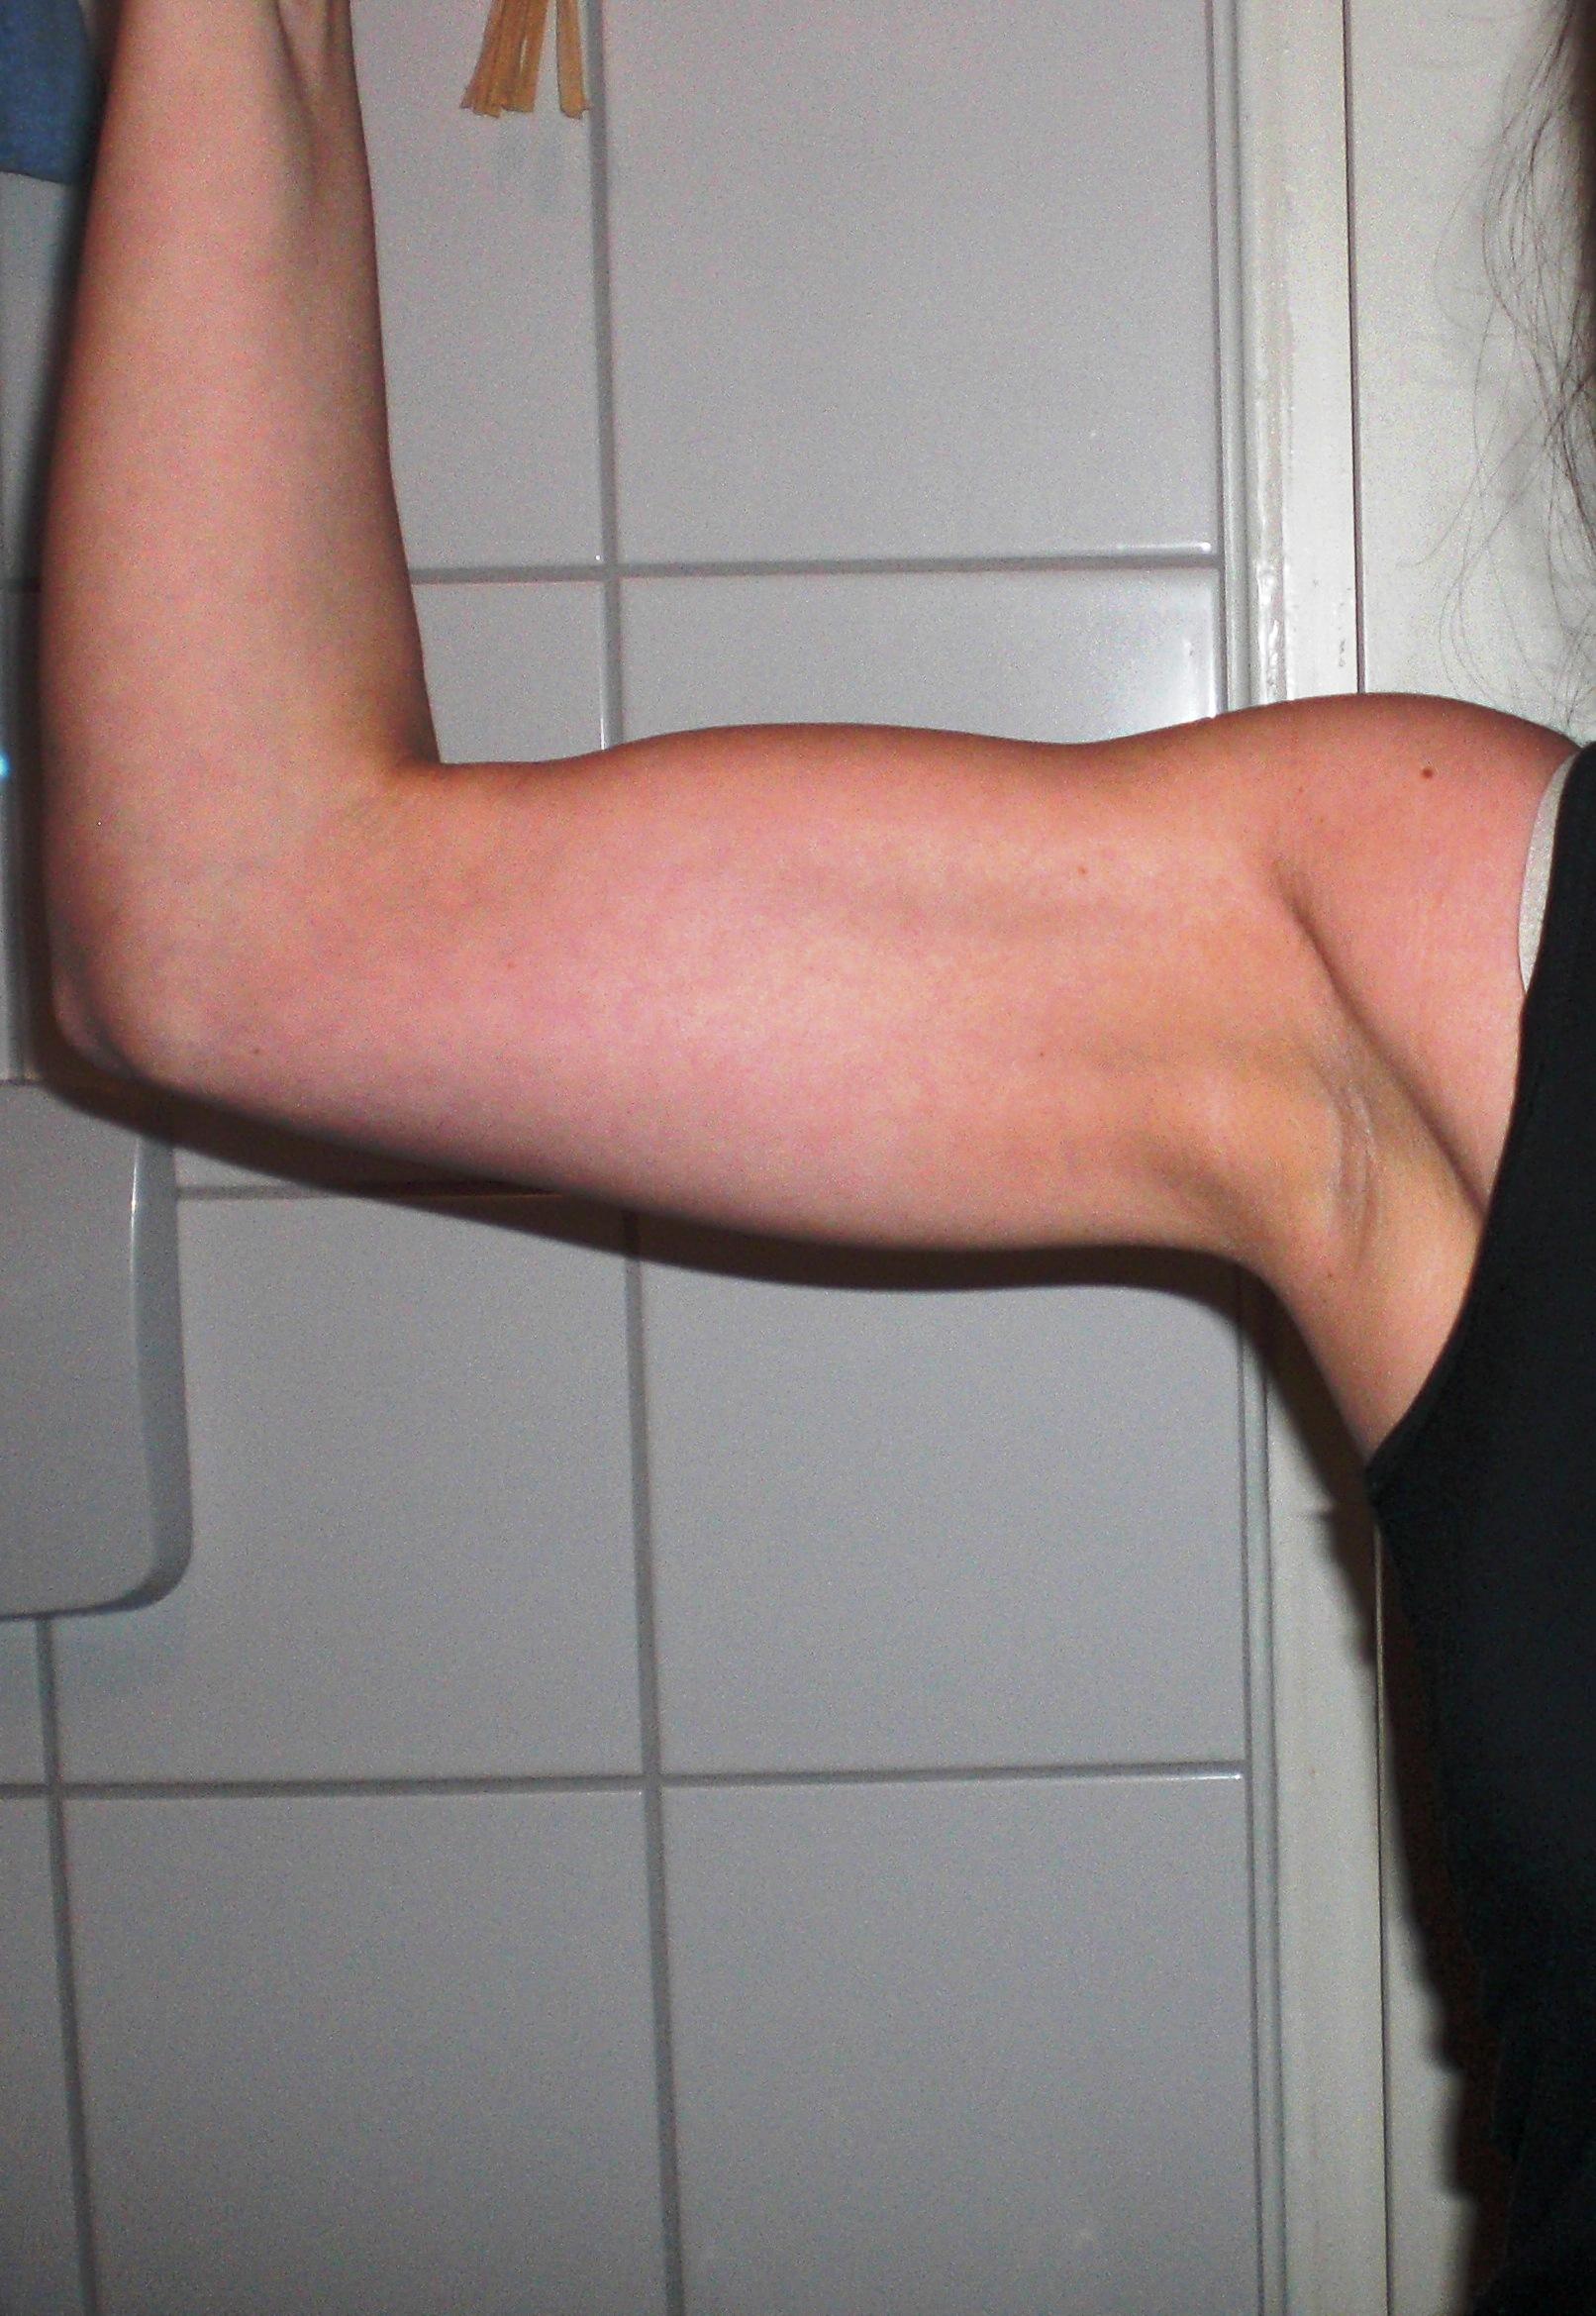 Muskelaufbau - Arme - Frau (Gesundheit, Sport, Training)